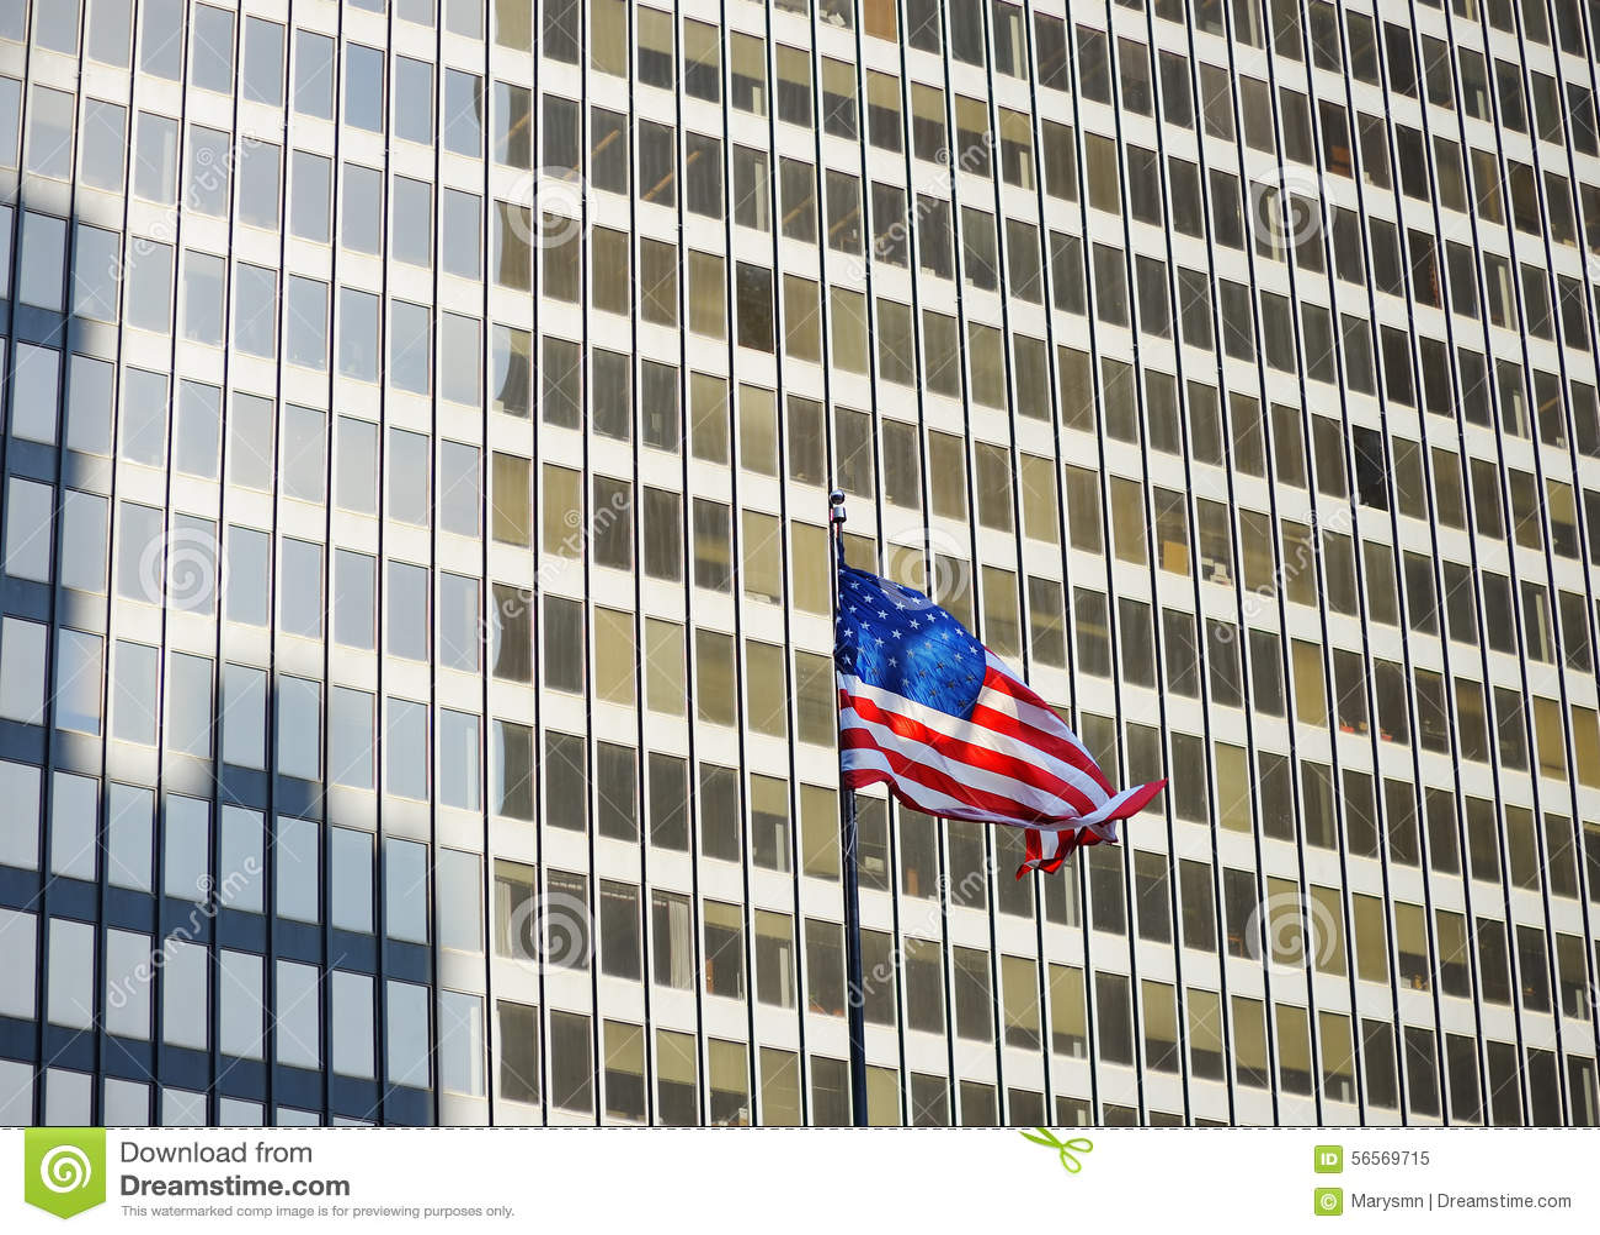 Download ΑΜΕΡΙΚΑΝΙΚΗ σημαία με τον ουρανοξύστη στο υπόβαθρο Στοκ Εικόνα - εικόνα από ομοσπονδιακός, διακόσμηση: 56569715